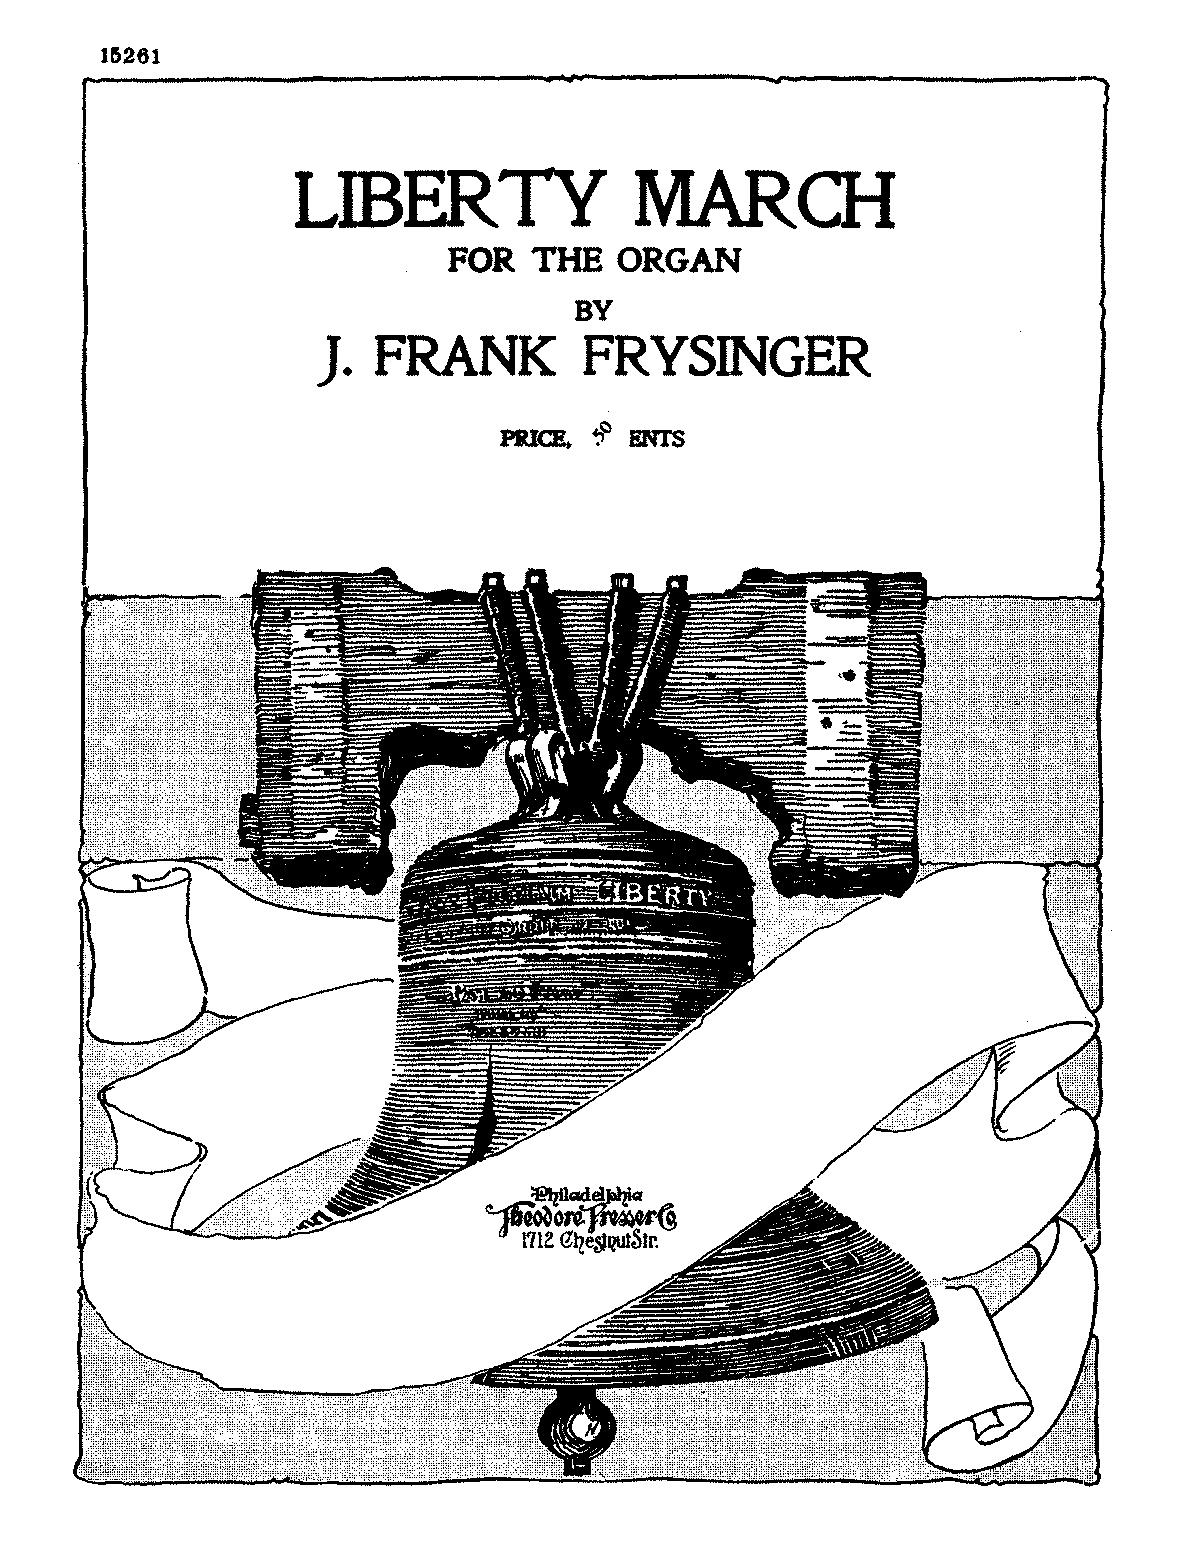 Liberty March (Frysinger, Frank) - IMSLP/Petrucci Music Library